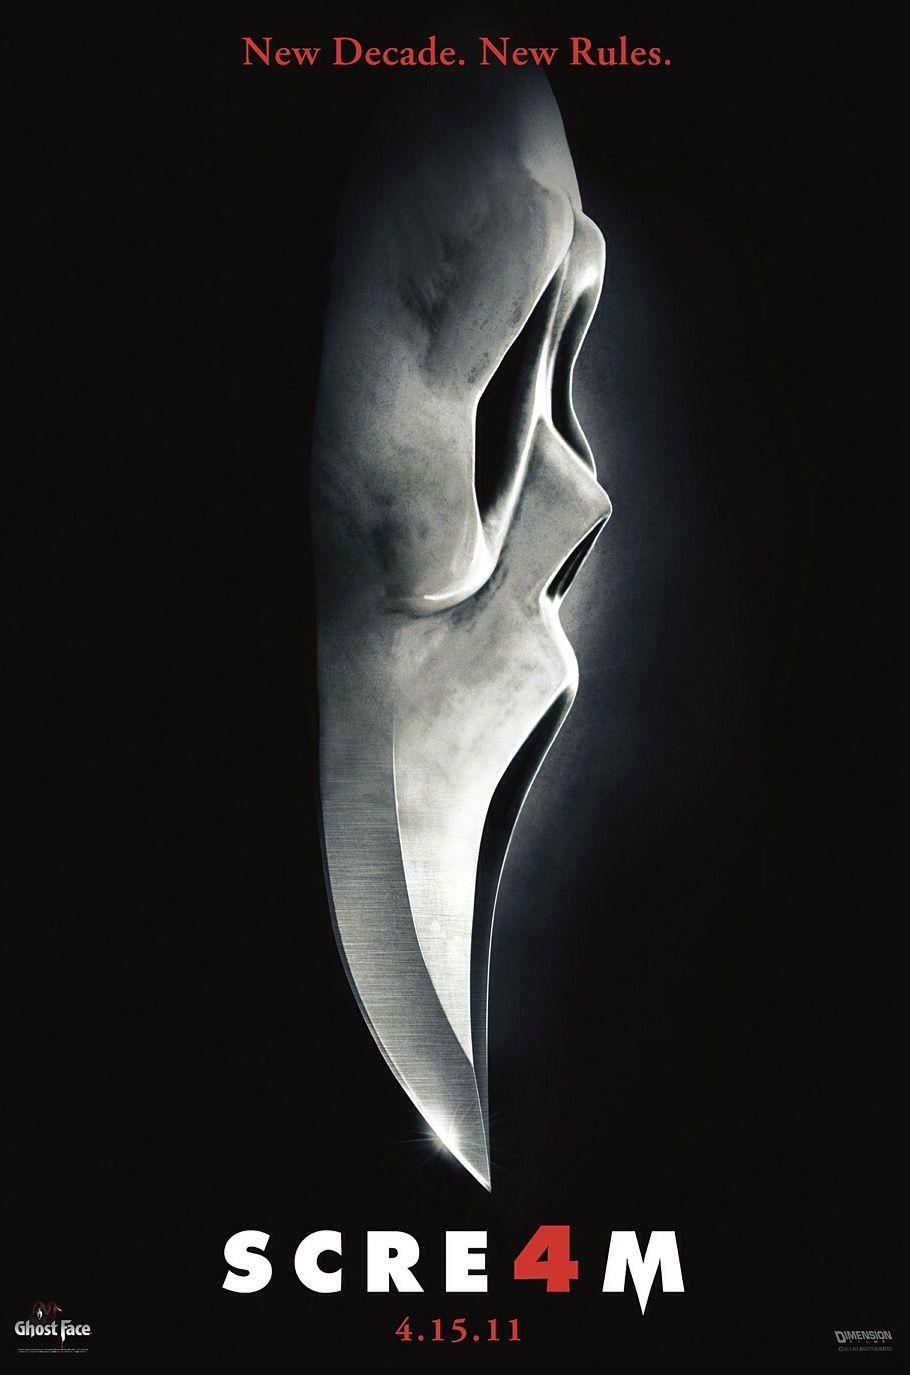 Pin By Jose Eduardo Velazquez Ramos On Movies Posters Cover Movie Soundtrack Horror Movies Horror Movie Posters Movie Posters